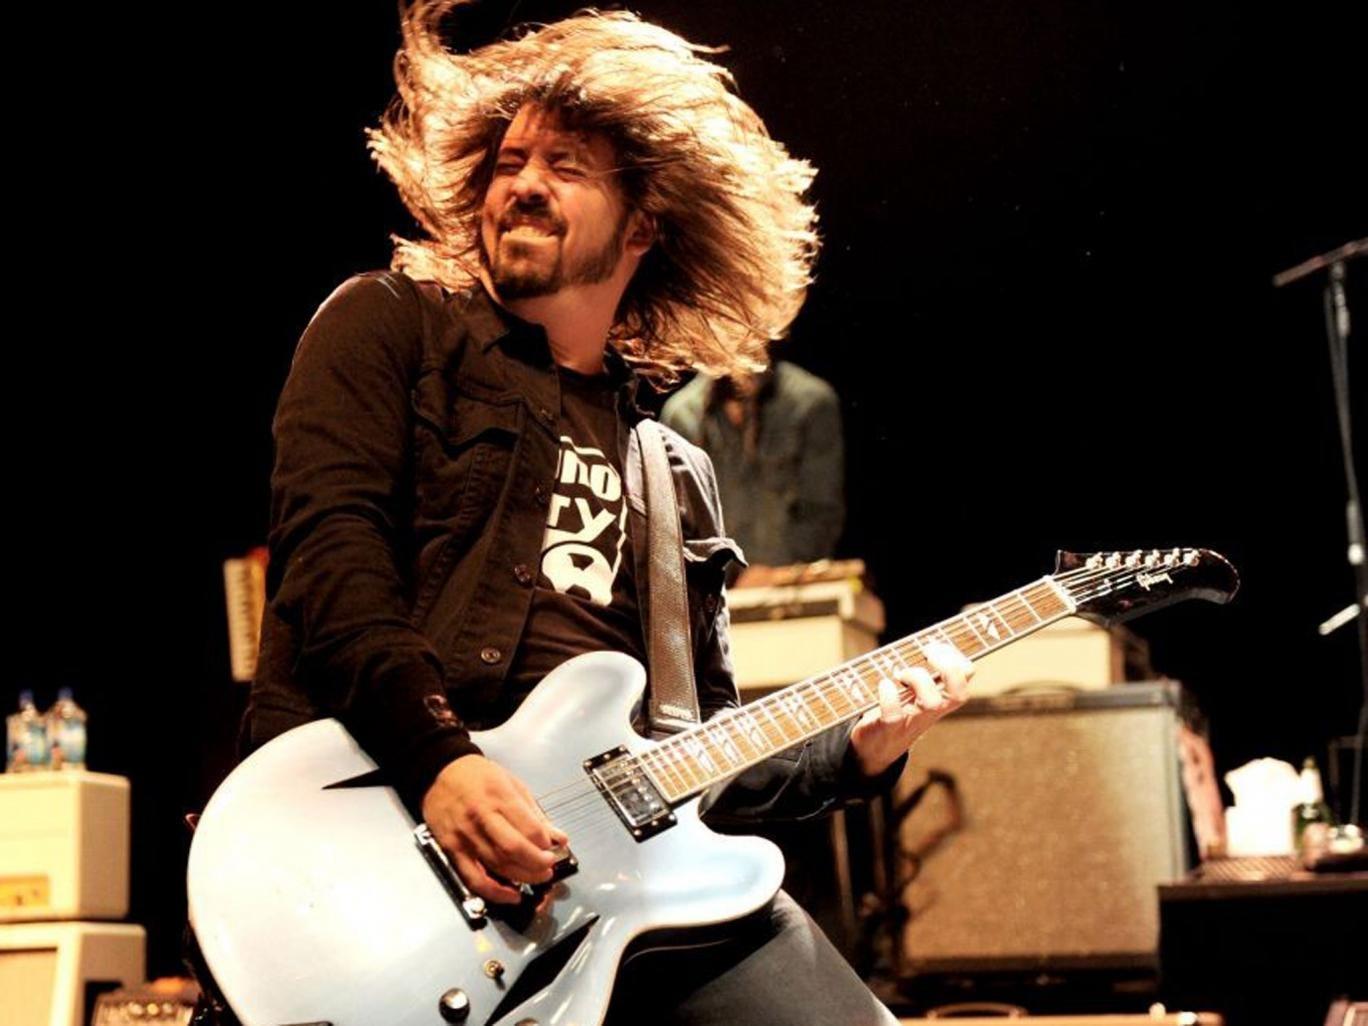 Foo Fighters are favourites to headline Glastonbury 2015